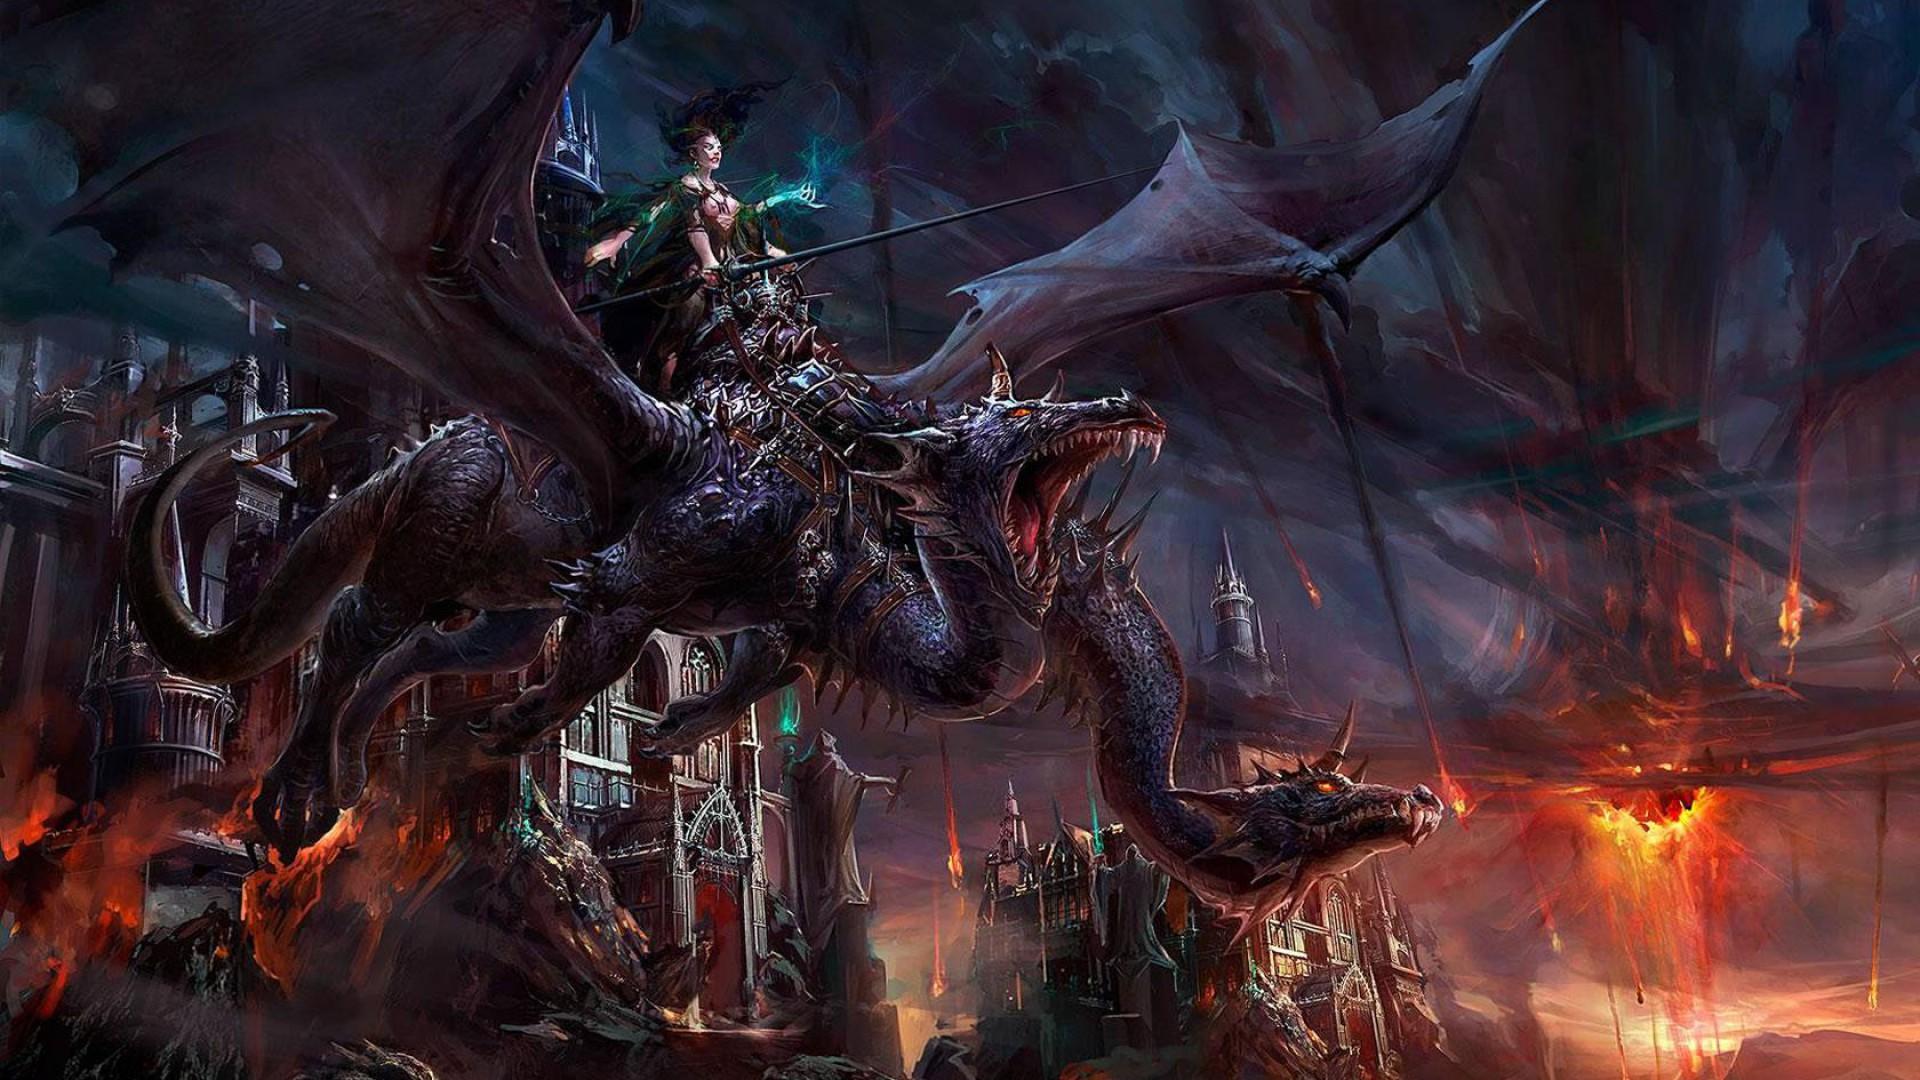 49+ Dragon Wallpaper 1080p on WallpaperSafari